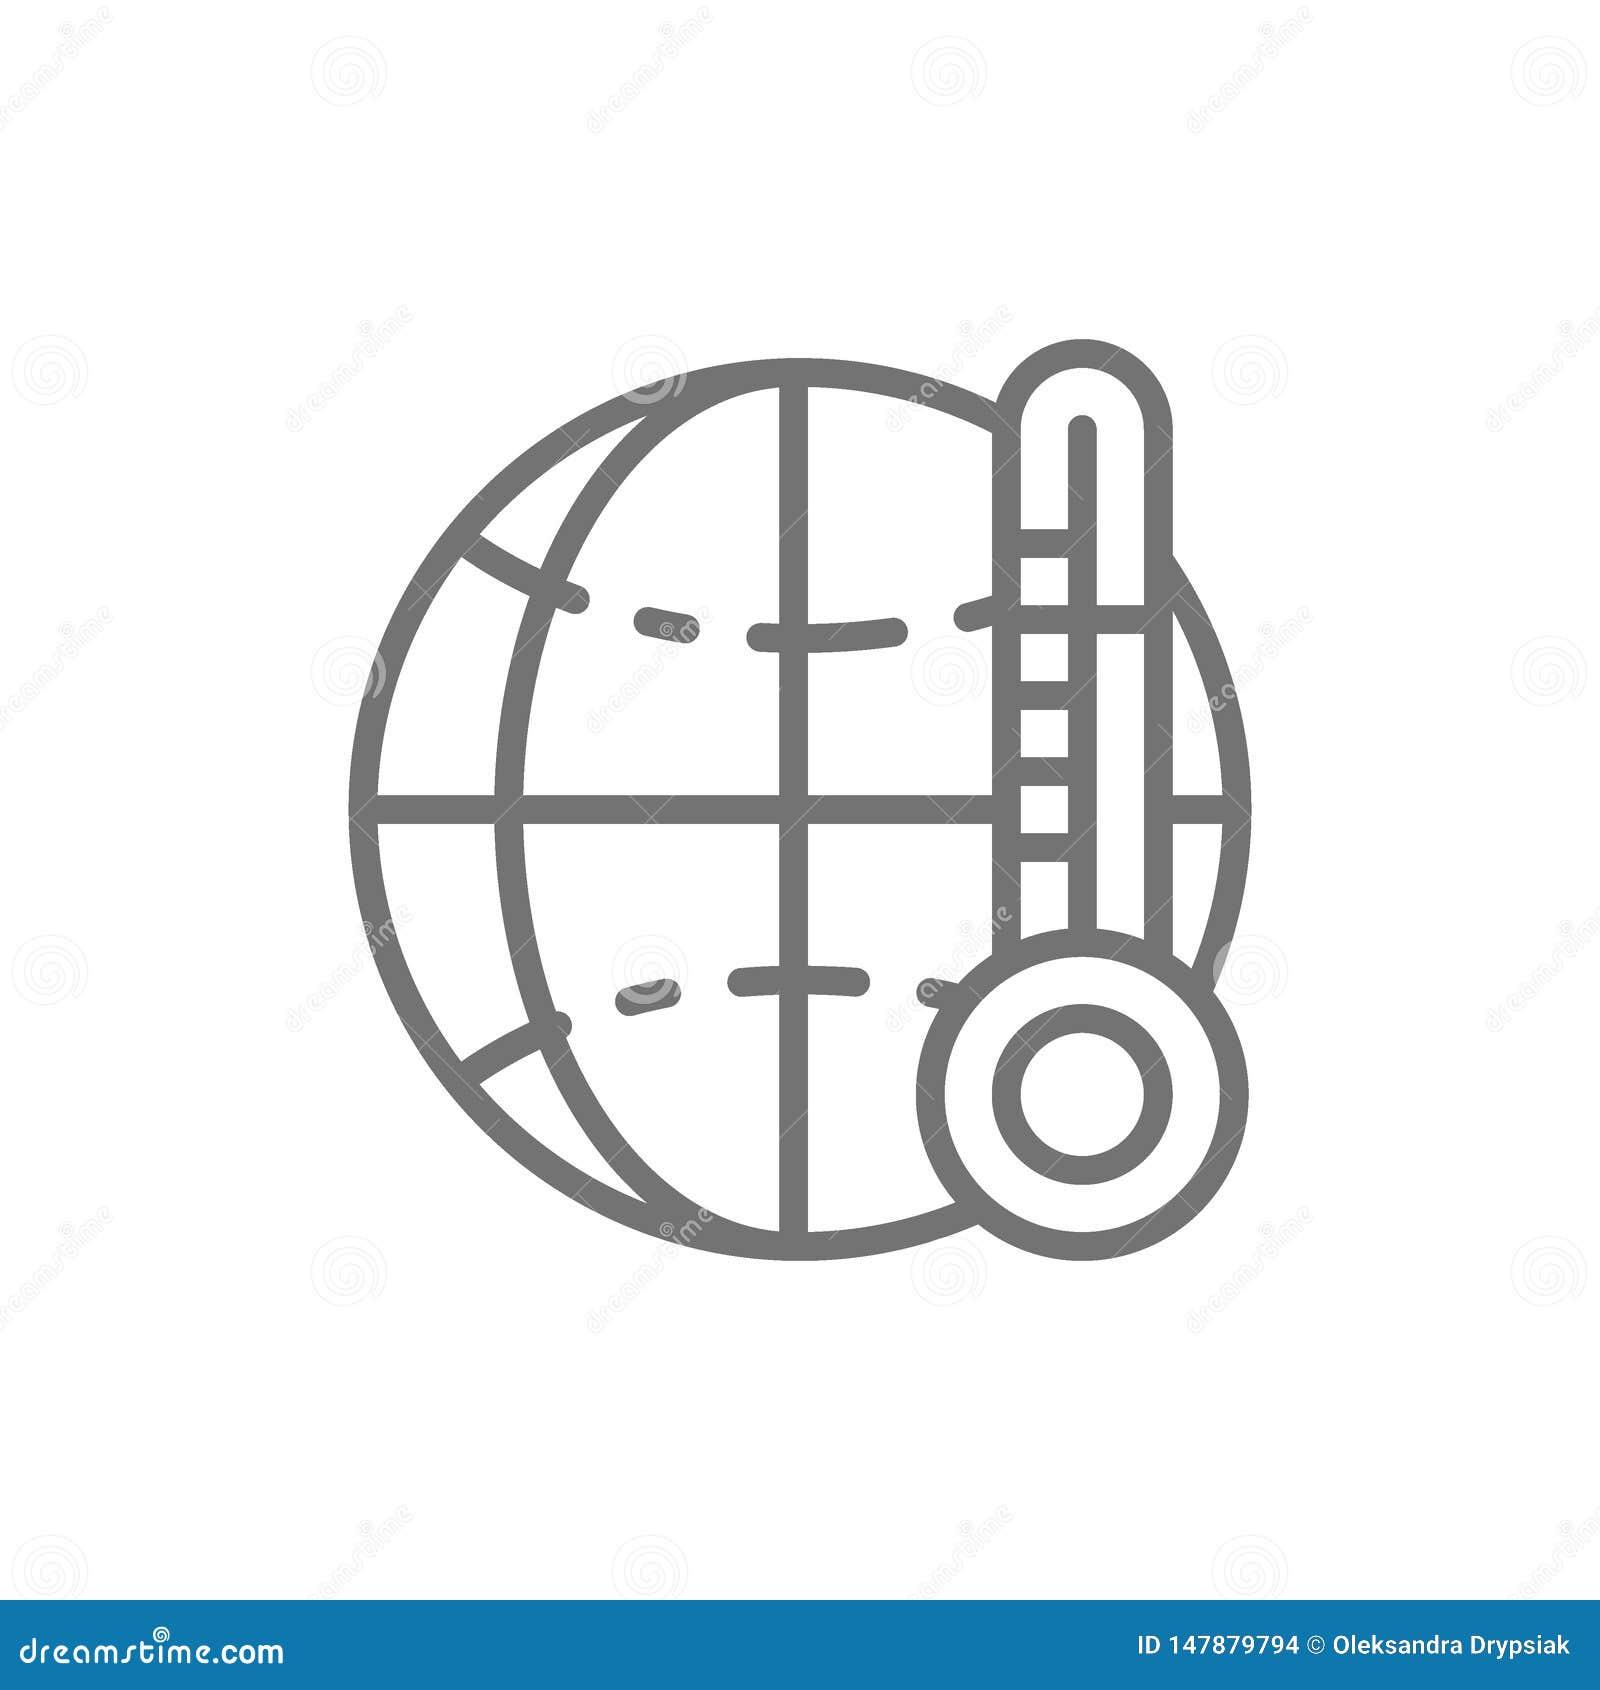 Global uppvärmning onormalt mycket varm linje symbol